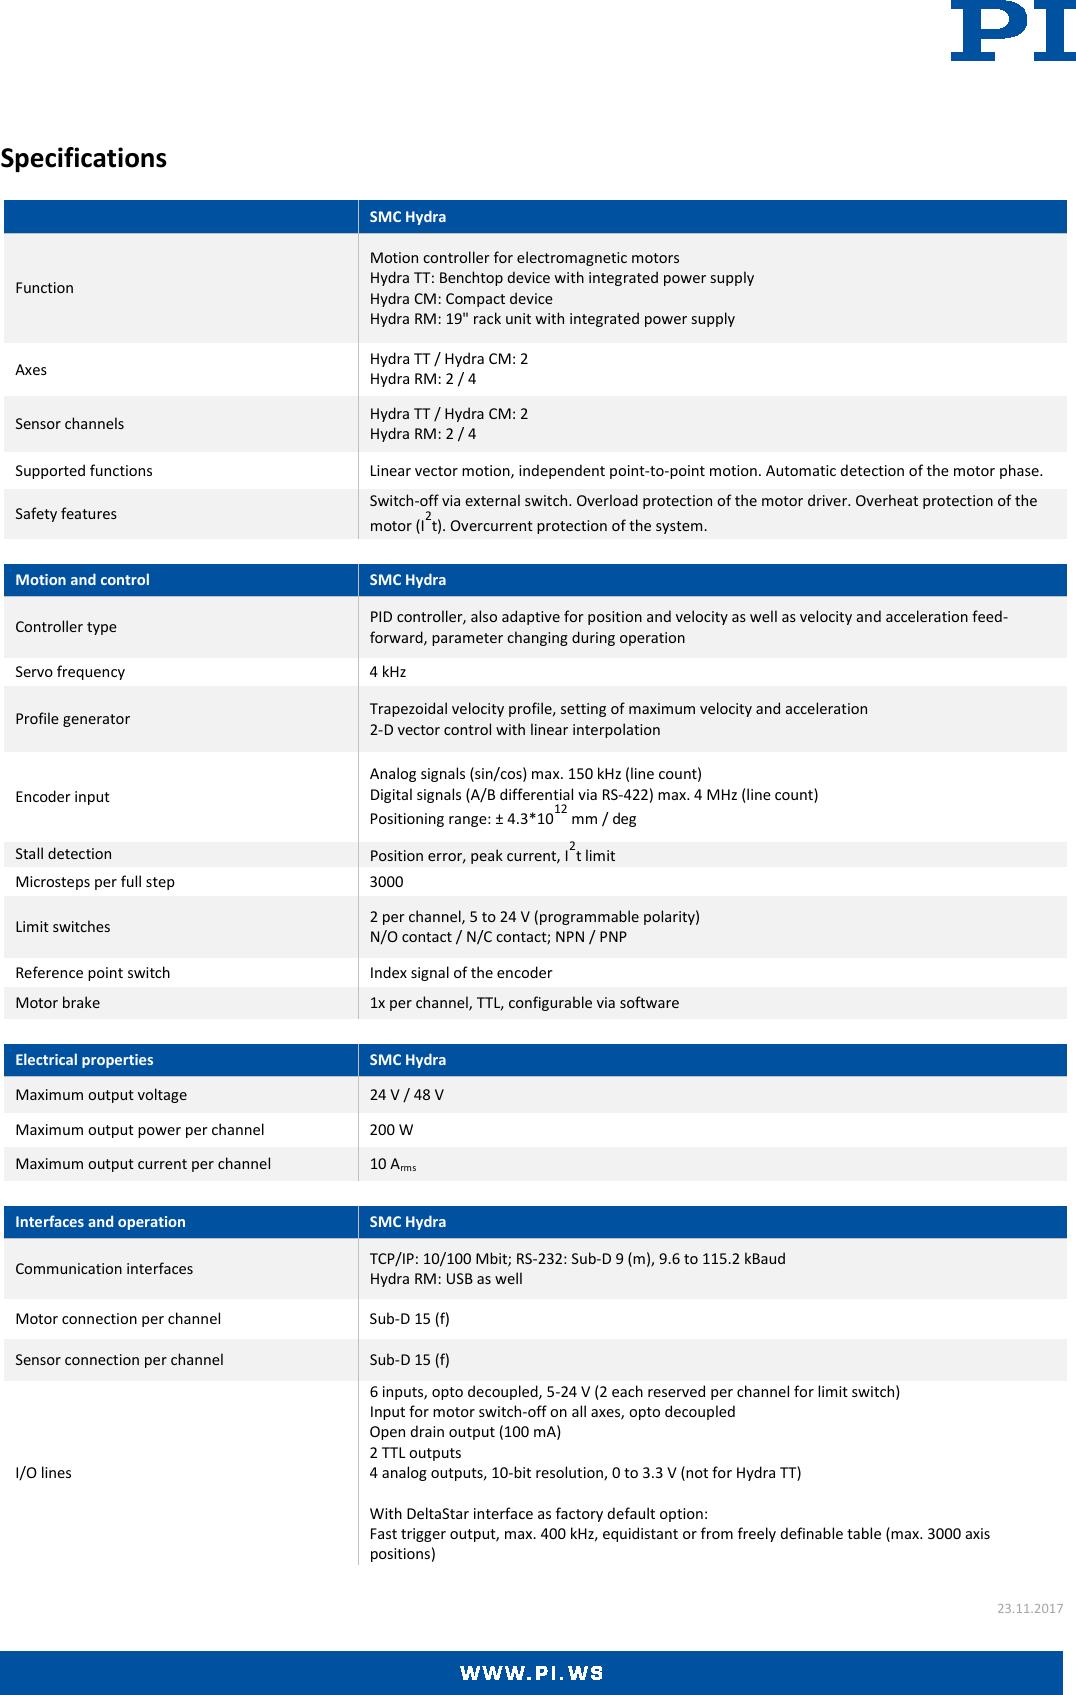 Physik Instrumente SMC Hydra Datasheet